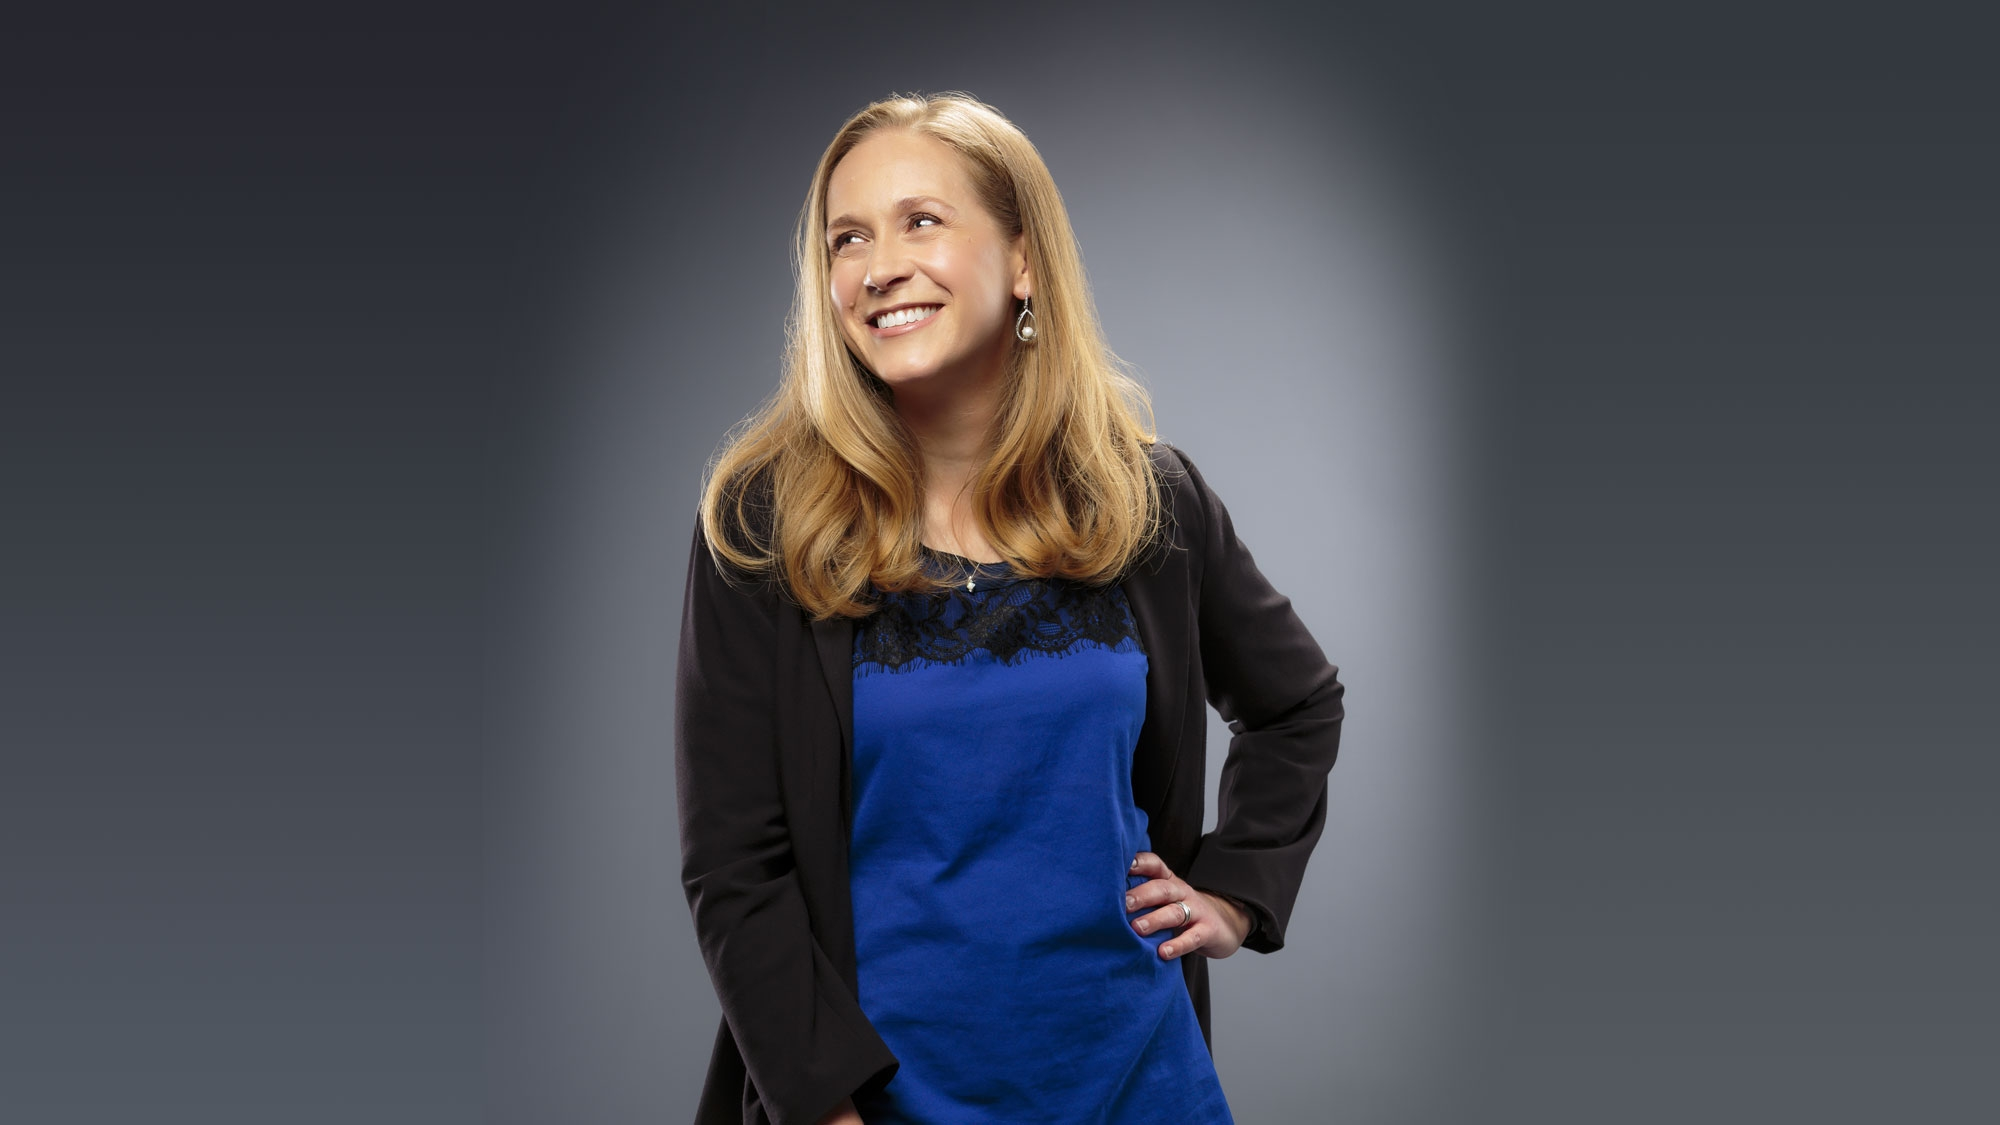 Beth Grabowski